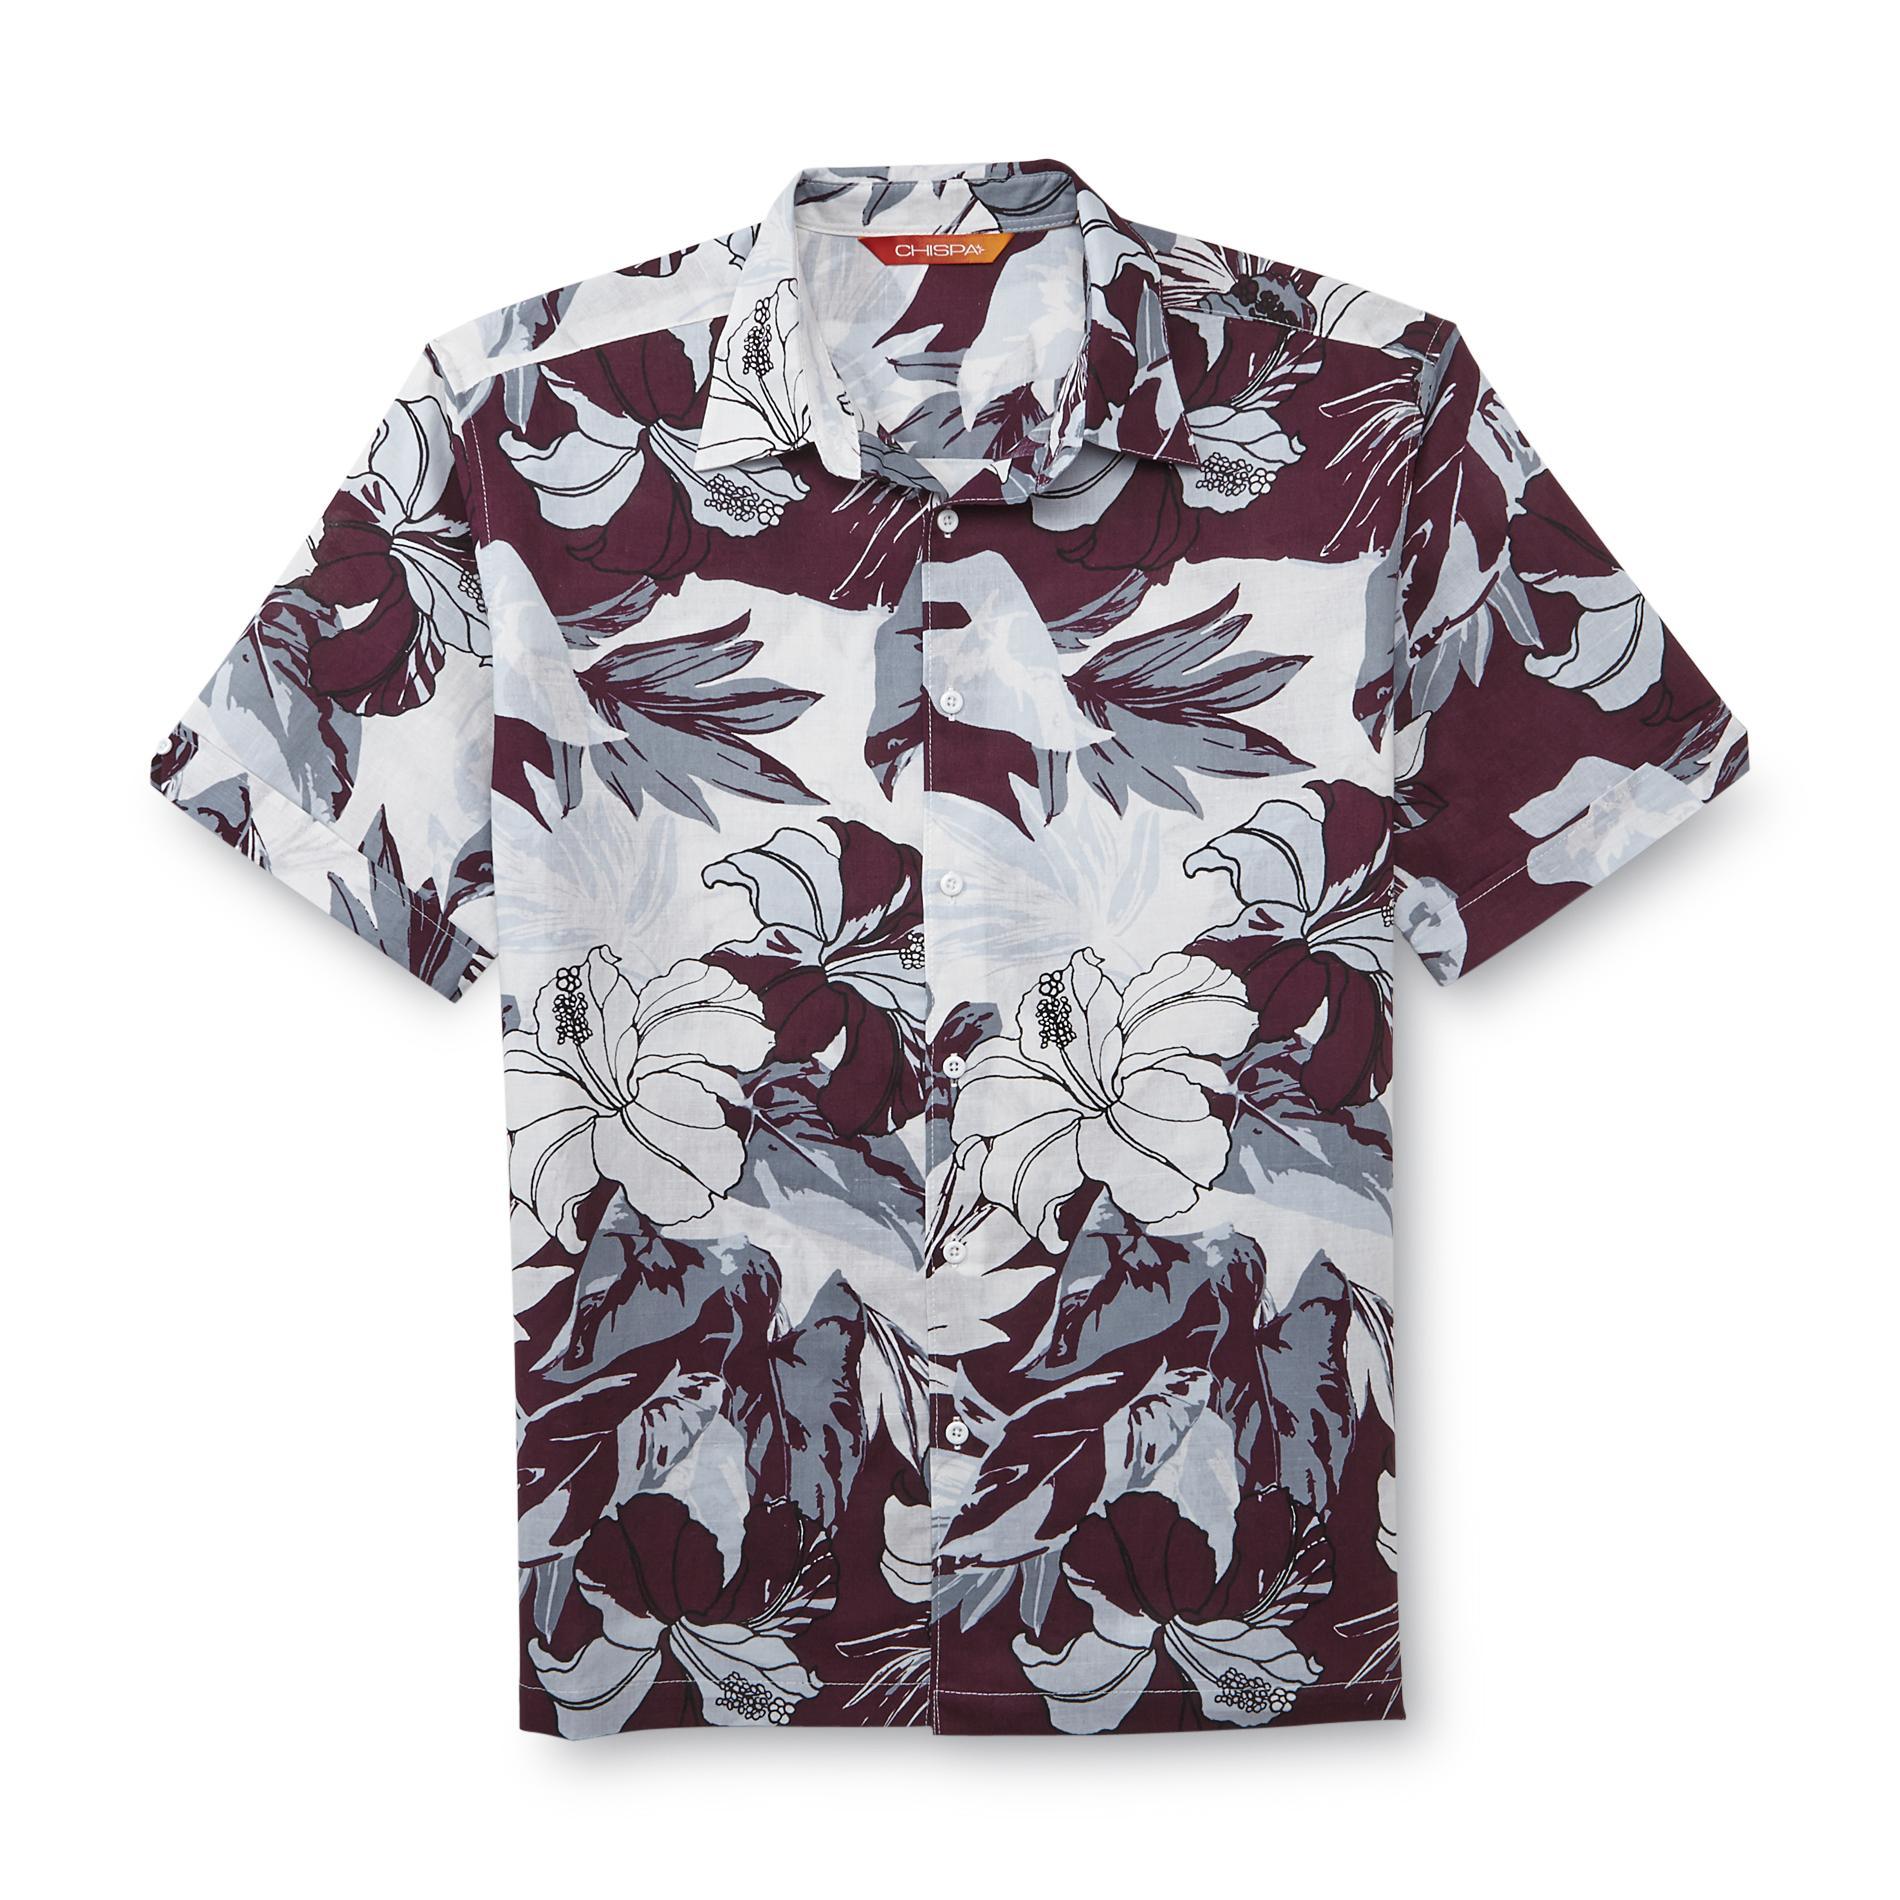 Meade Men's Camp Shirt - Floral Print